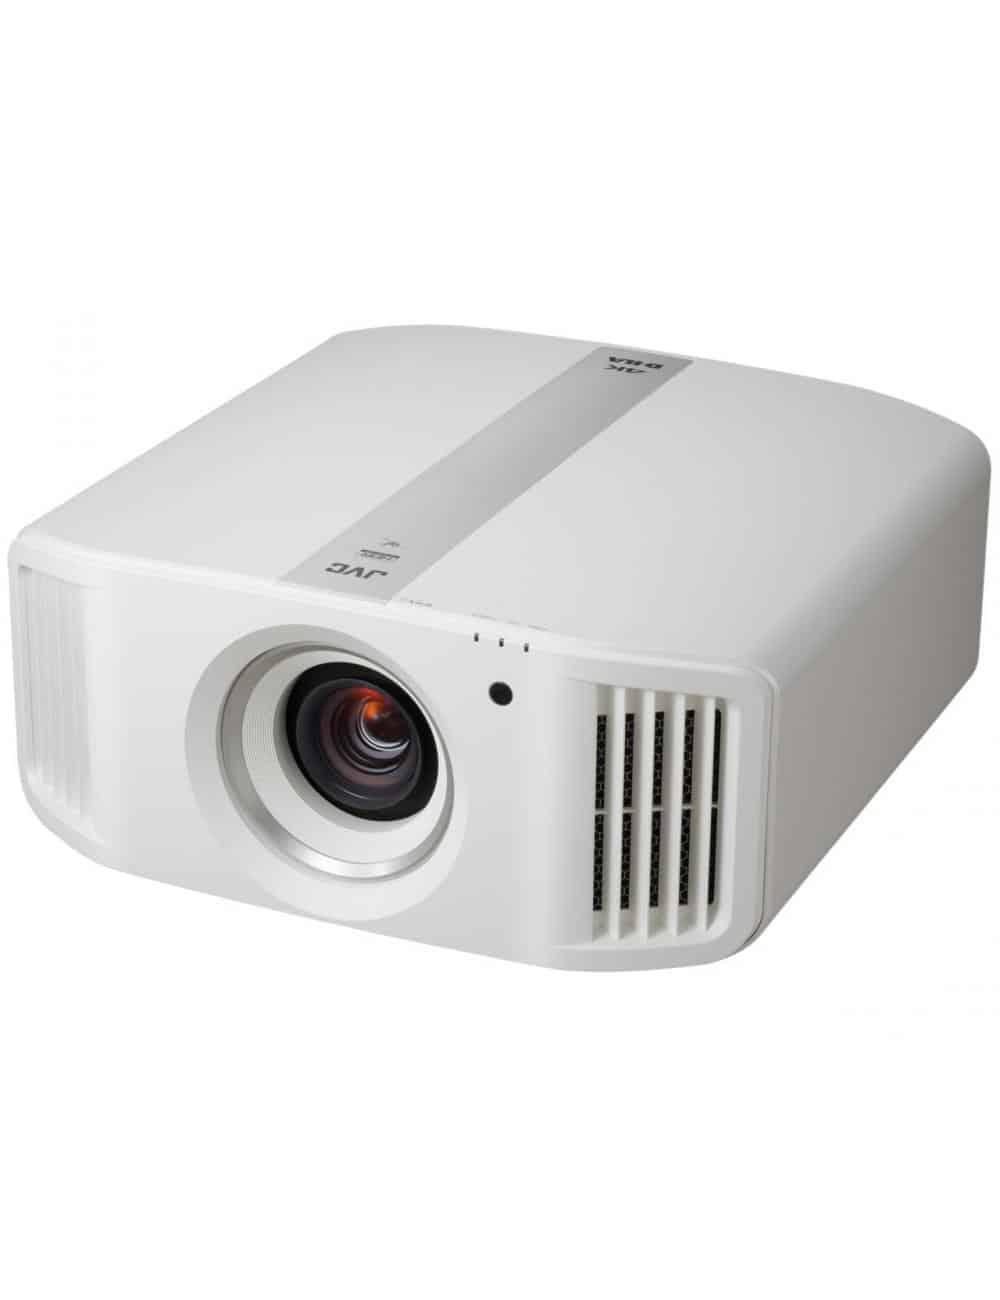 Proiettore 4K HDR D-ILA per Home Cinema, JVC DLA-N5, finitura white